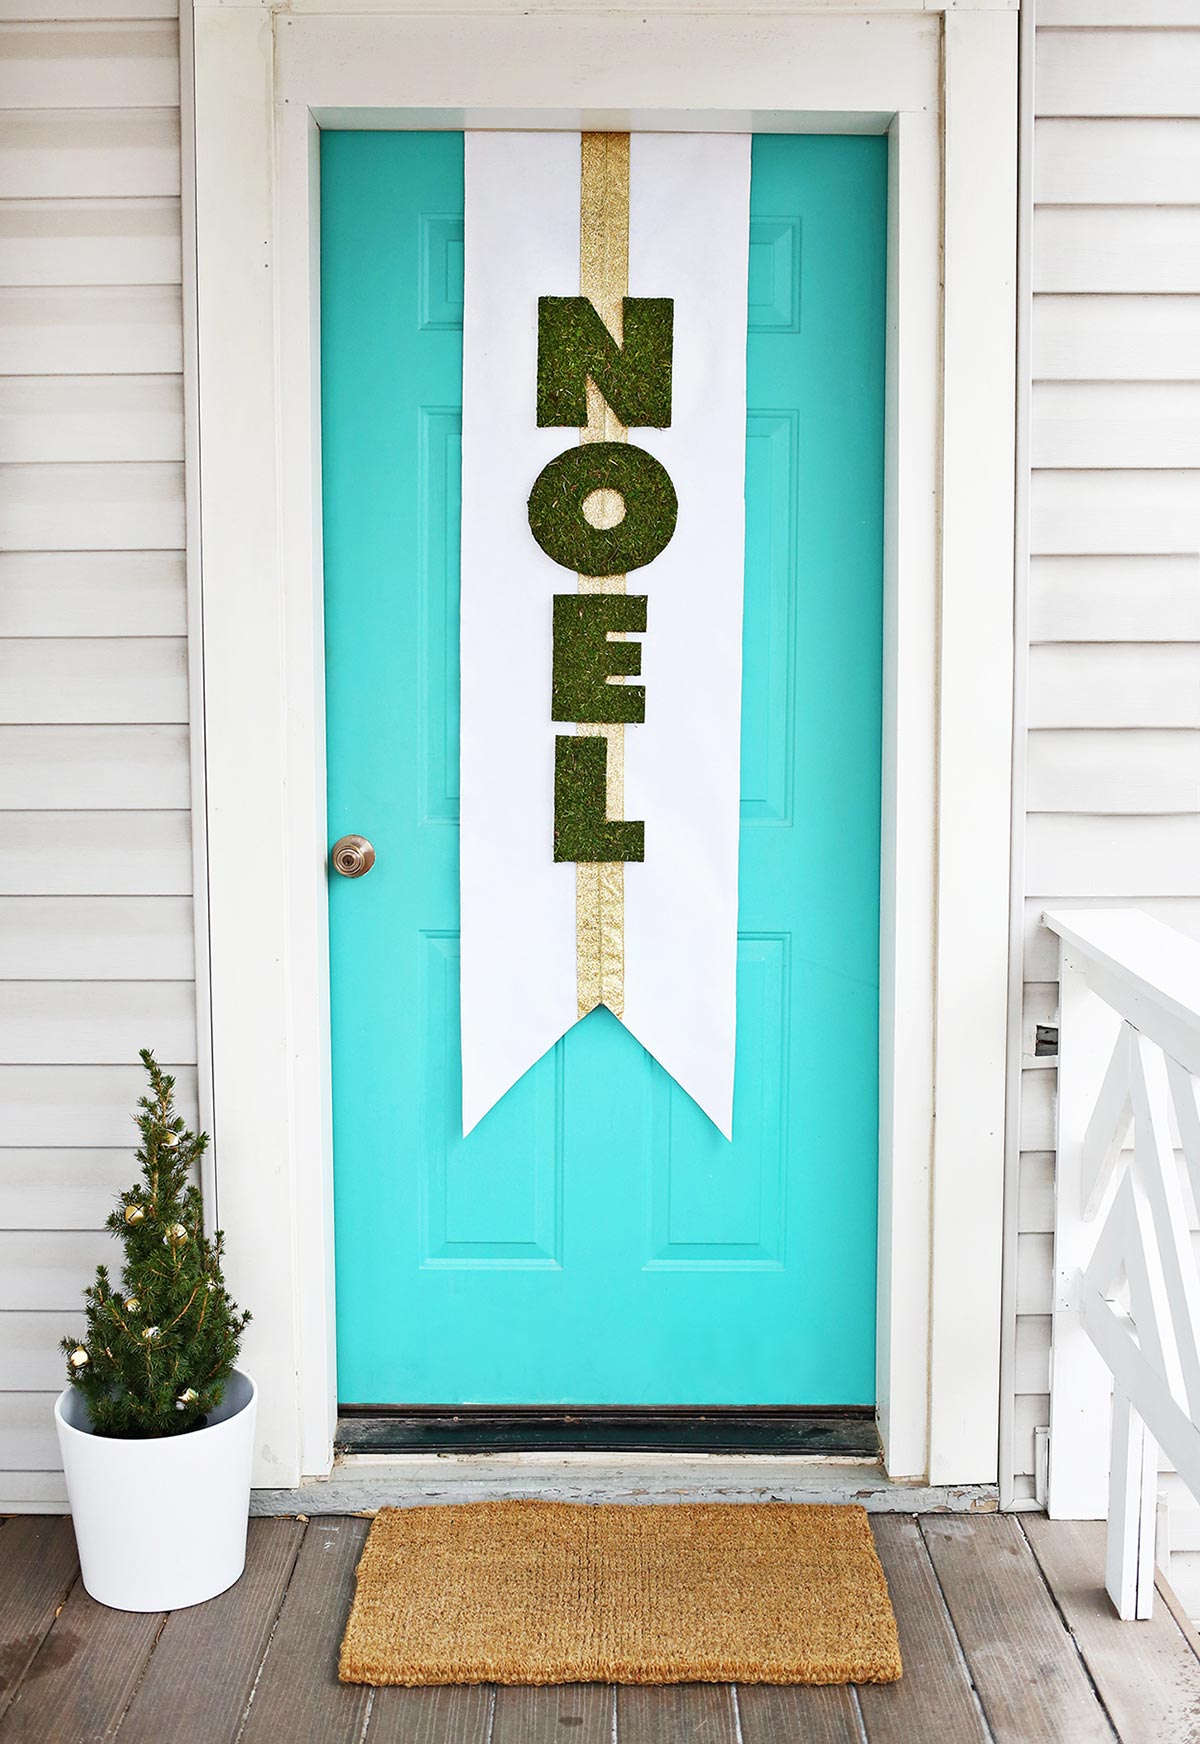 Sinalize: enfeites de Natal para portas e janelas